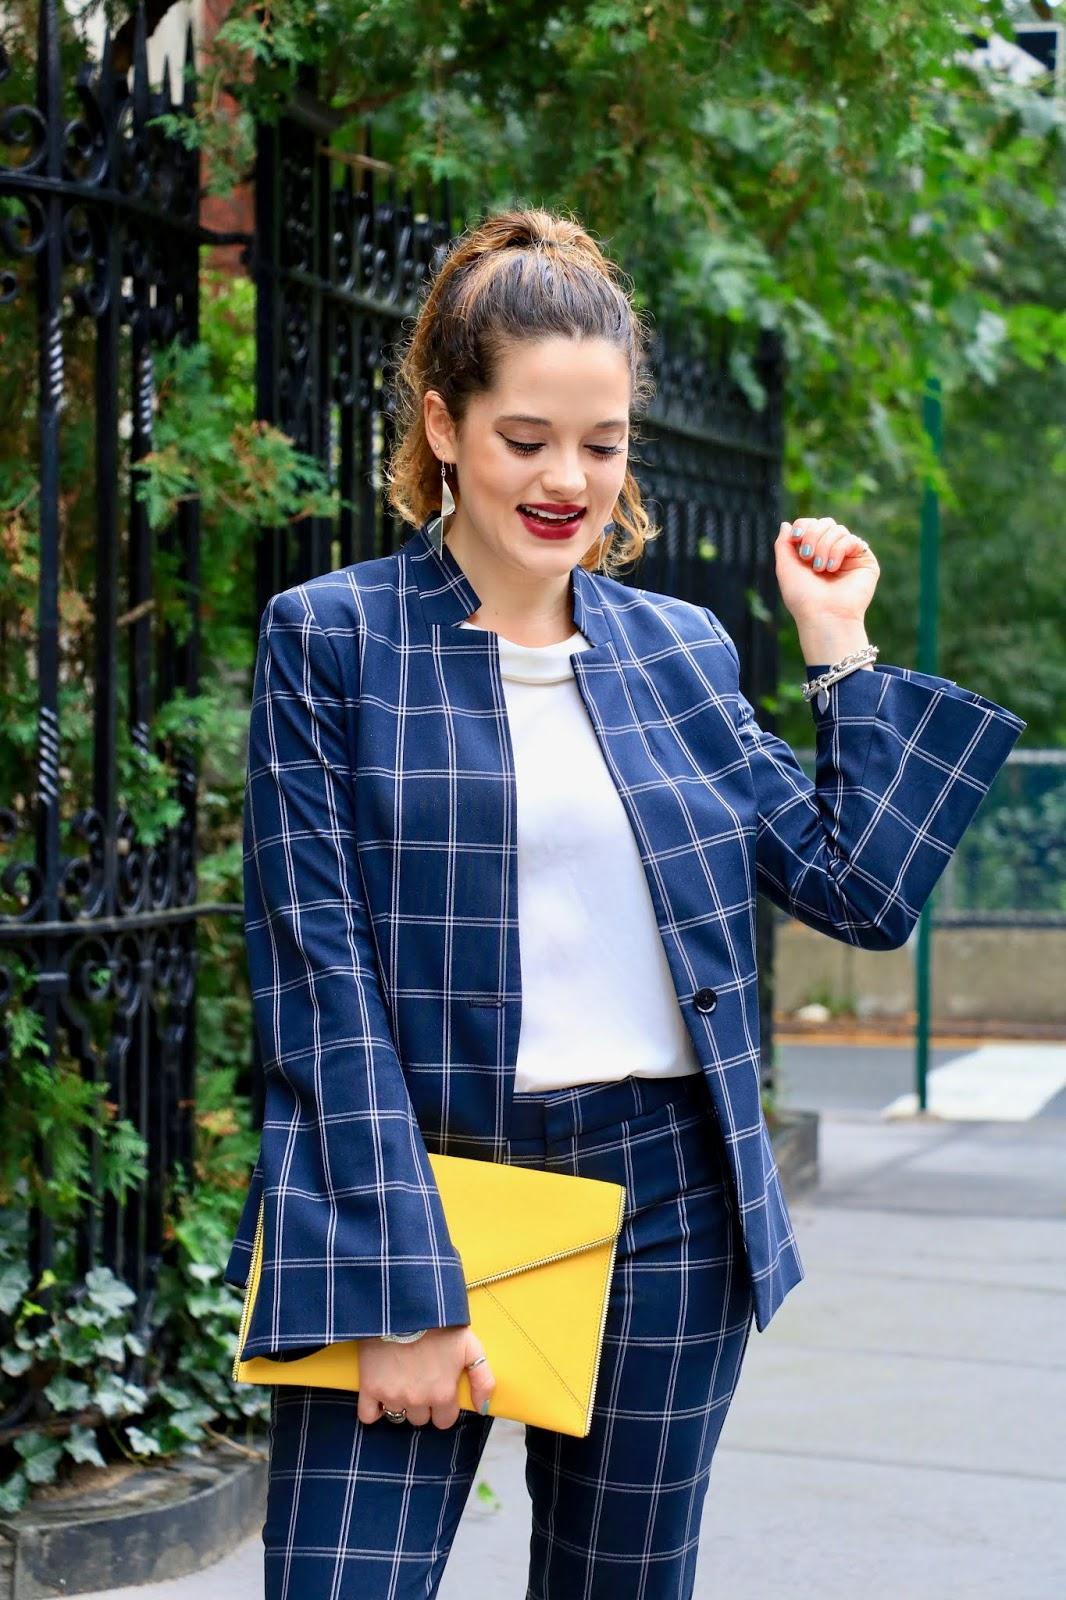 Nyc fashion blogger Kathleen Harper wearing 2018 fall fashion trends